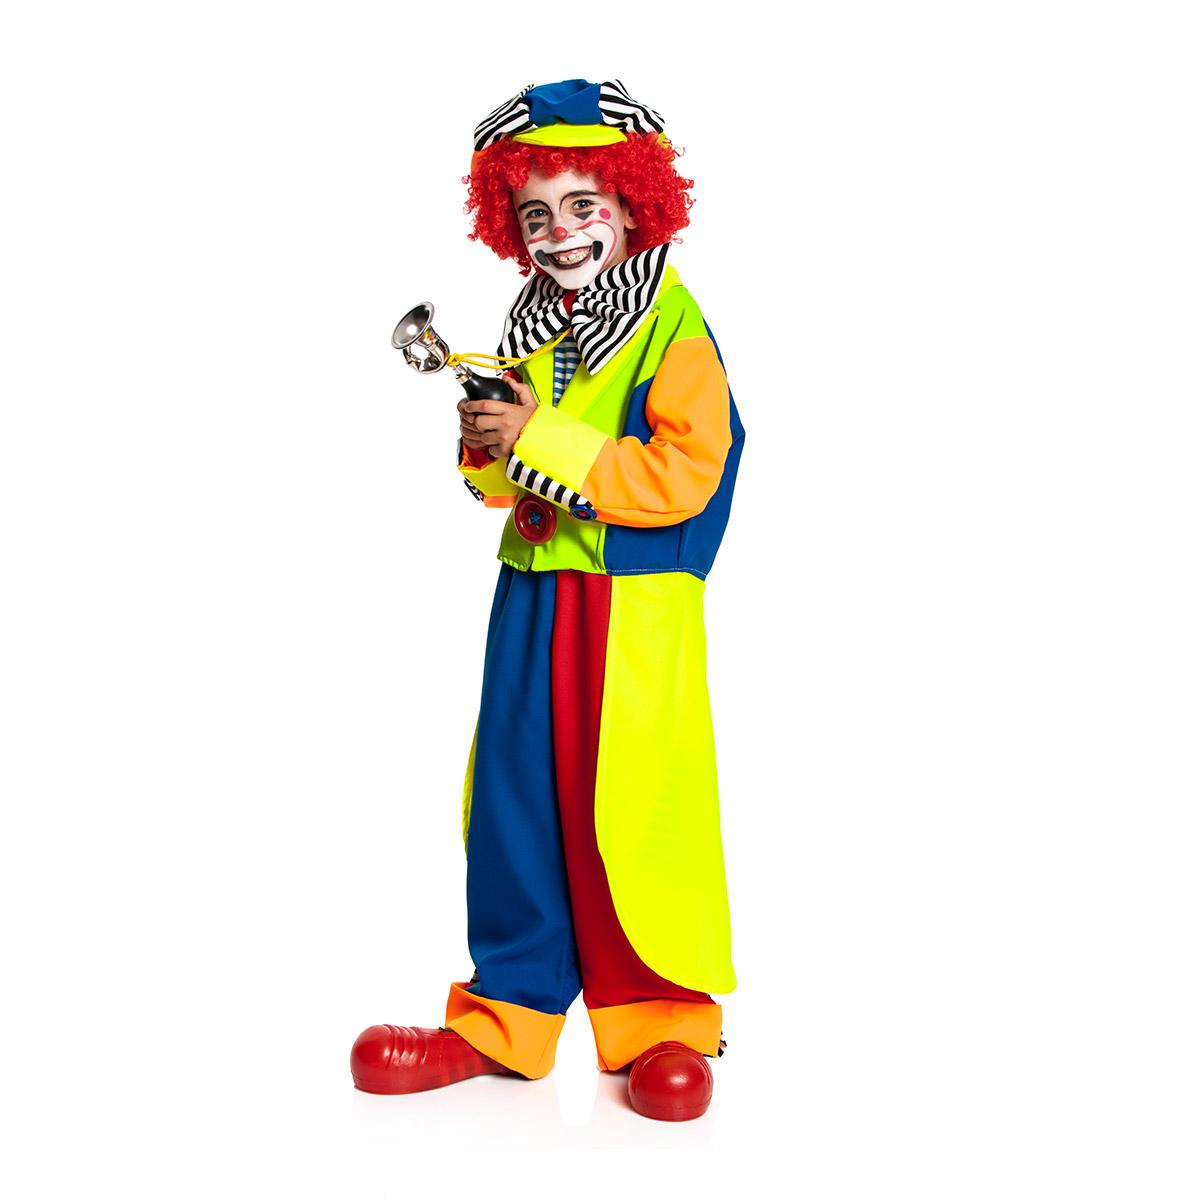 clown kost m kinder jungen mit m tze komplett kost mplanet. Black Bedroom Furniture Sets. Home Design Ideas